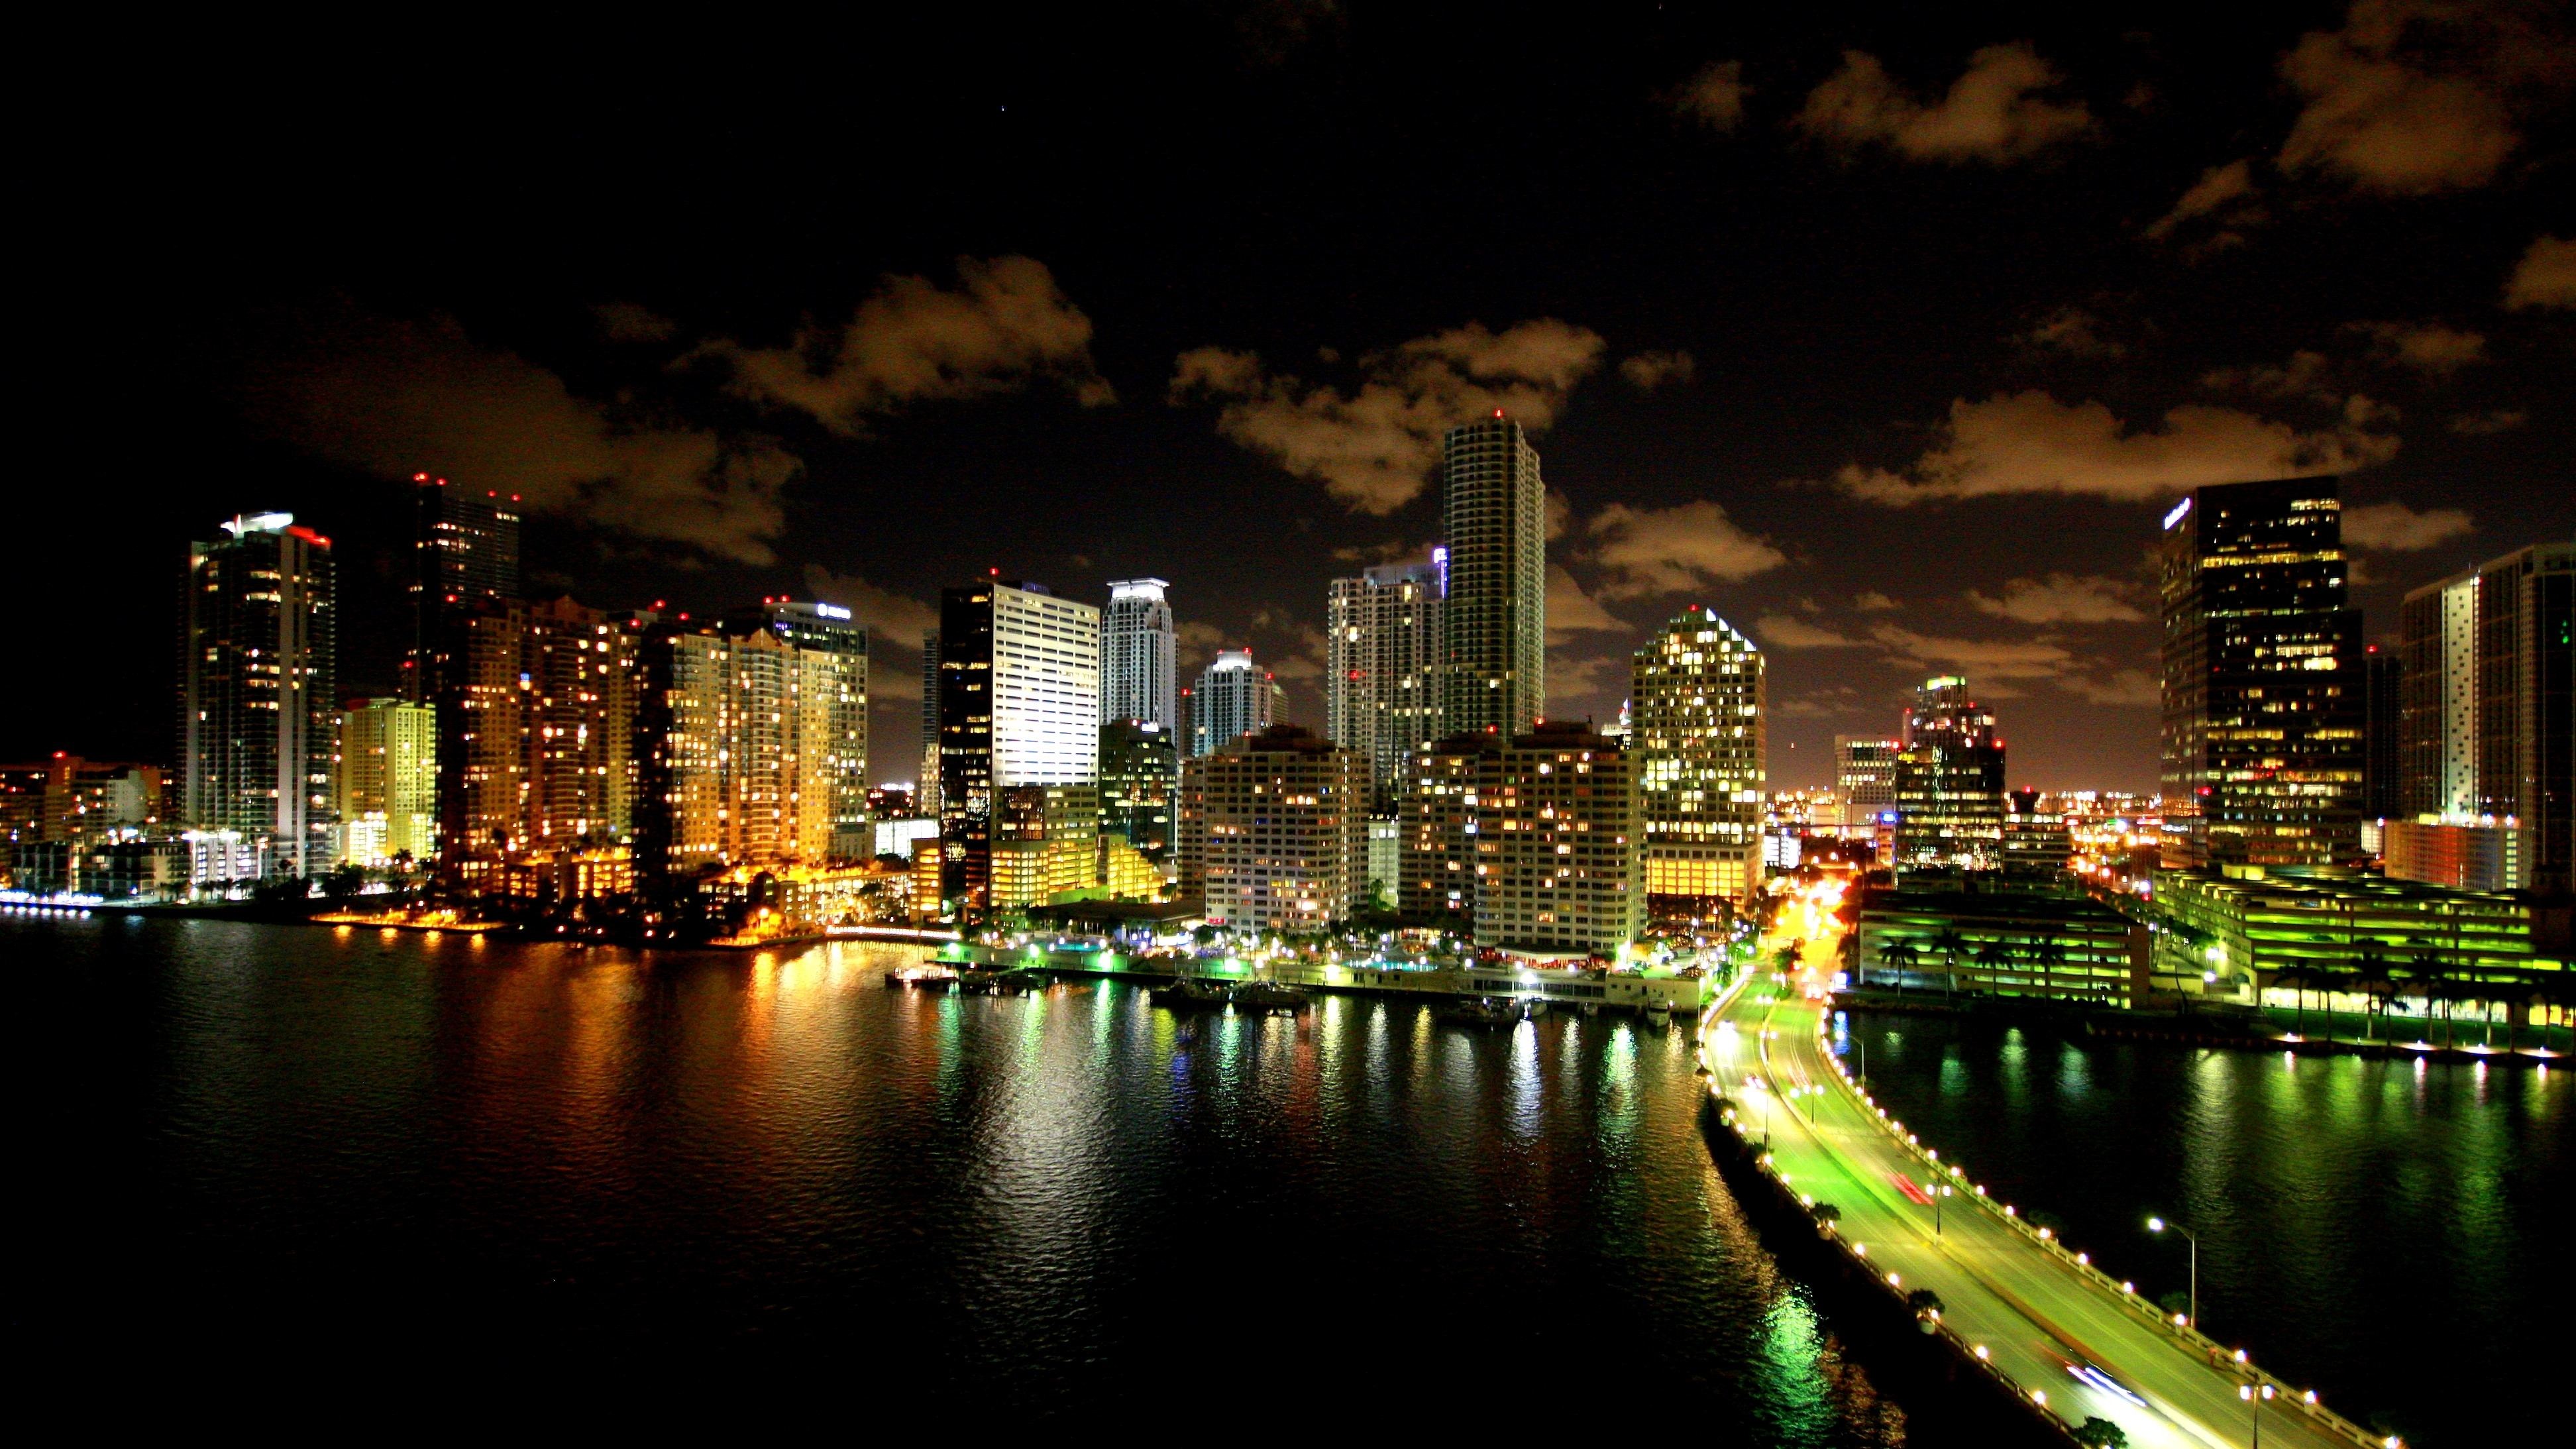 Wallpaper Contractors Miami Wallpapersafari HD Wallpapers Download Free Images Wallpaper [1000image.com]